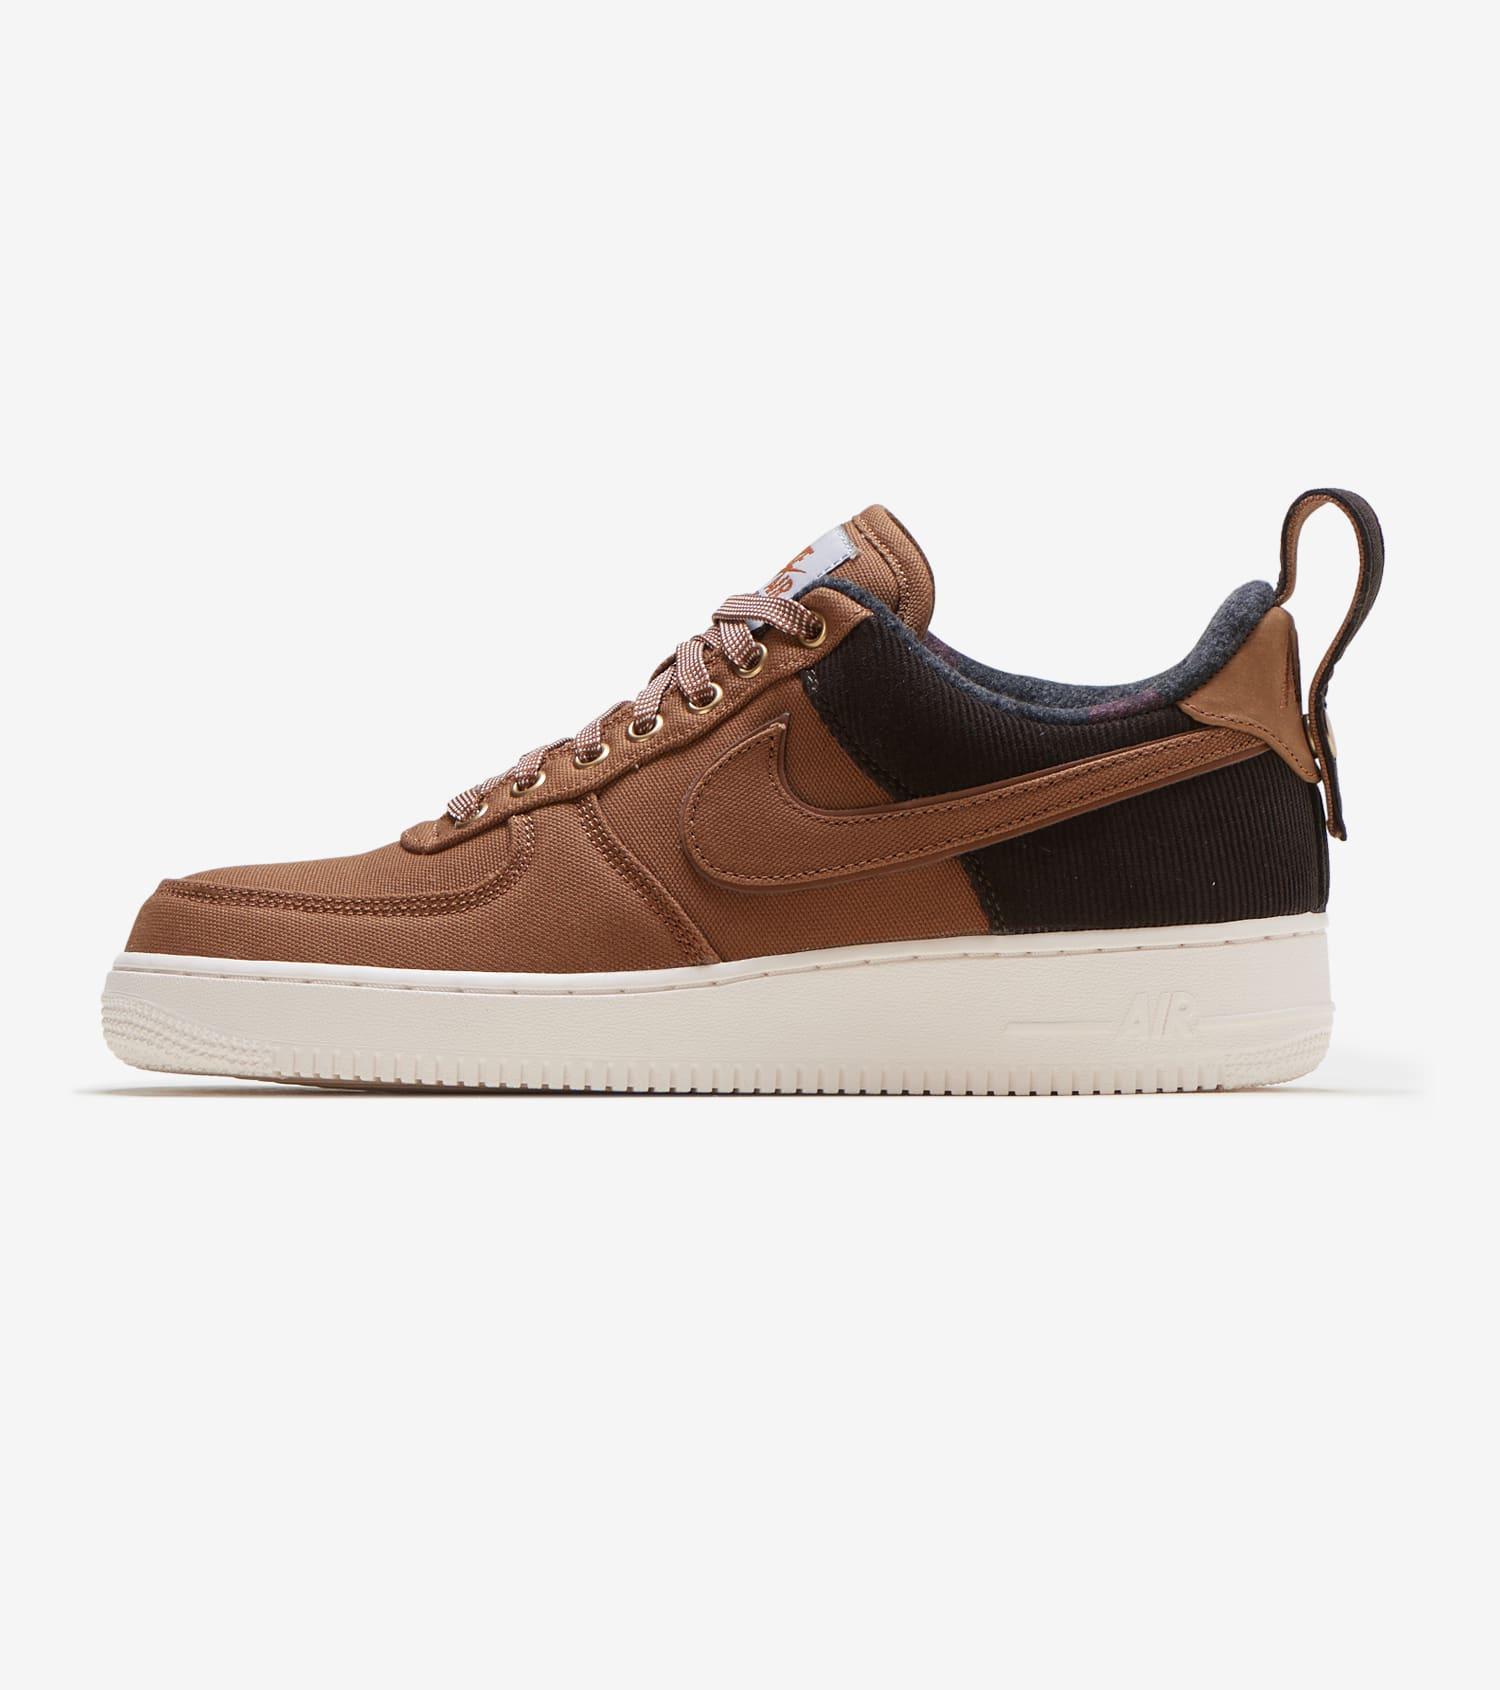 Nike x Carhartt Men Air Force 1 '07 Prm Wip (ale brown ale brown sail)